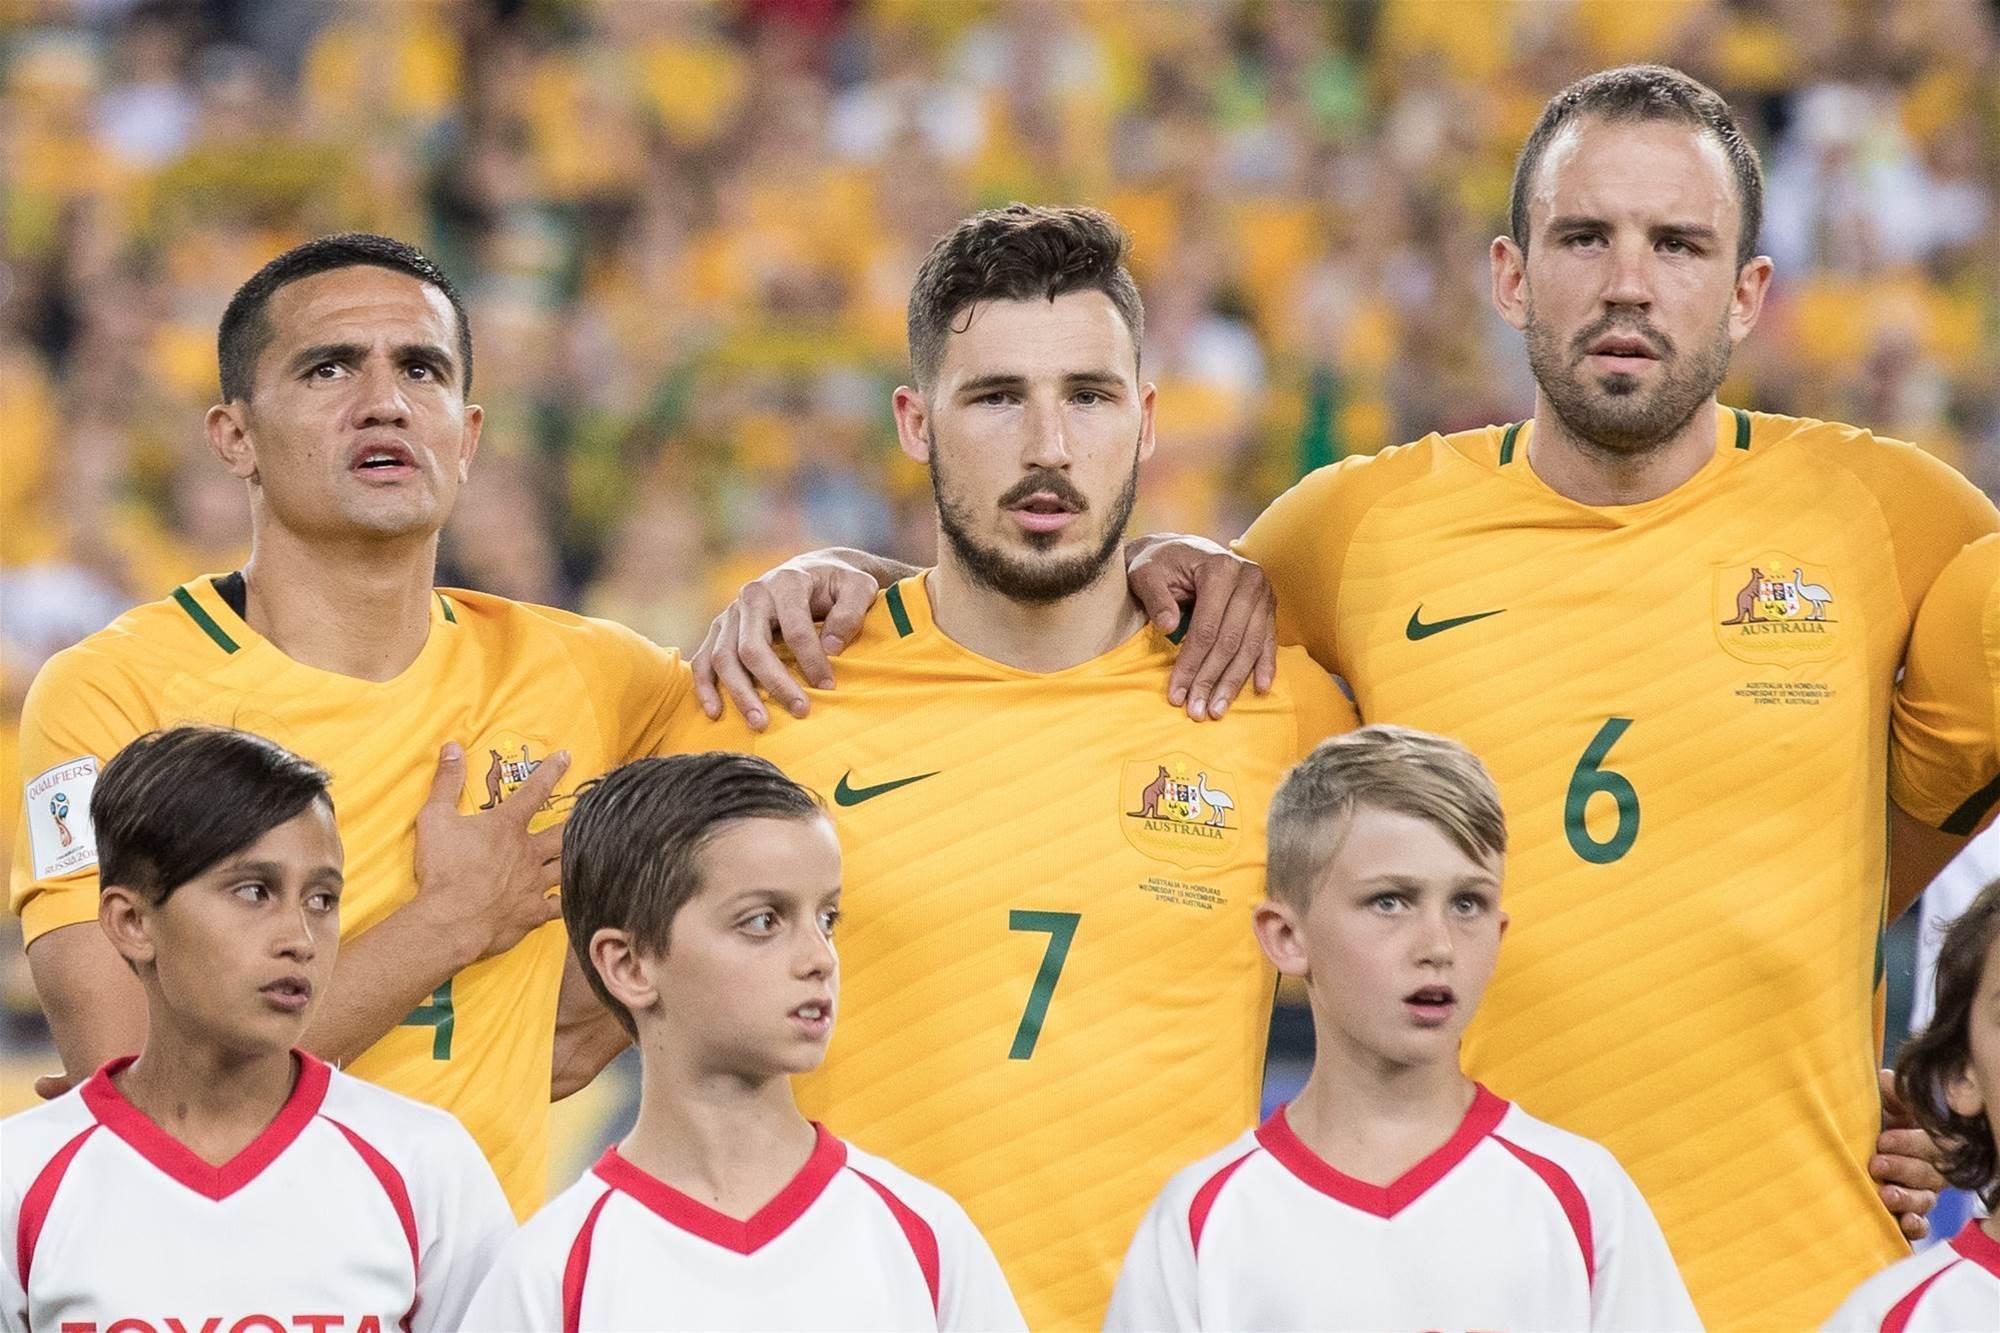 PFA: Don't let crisis jeopardise Roos, Matildas